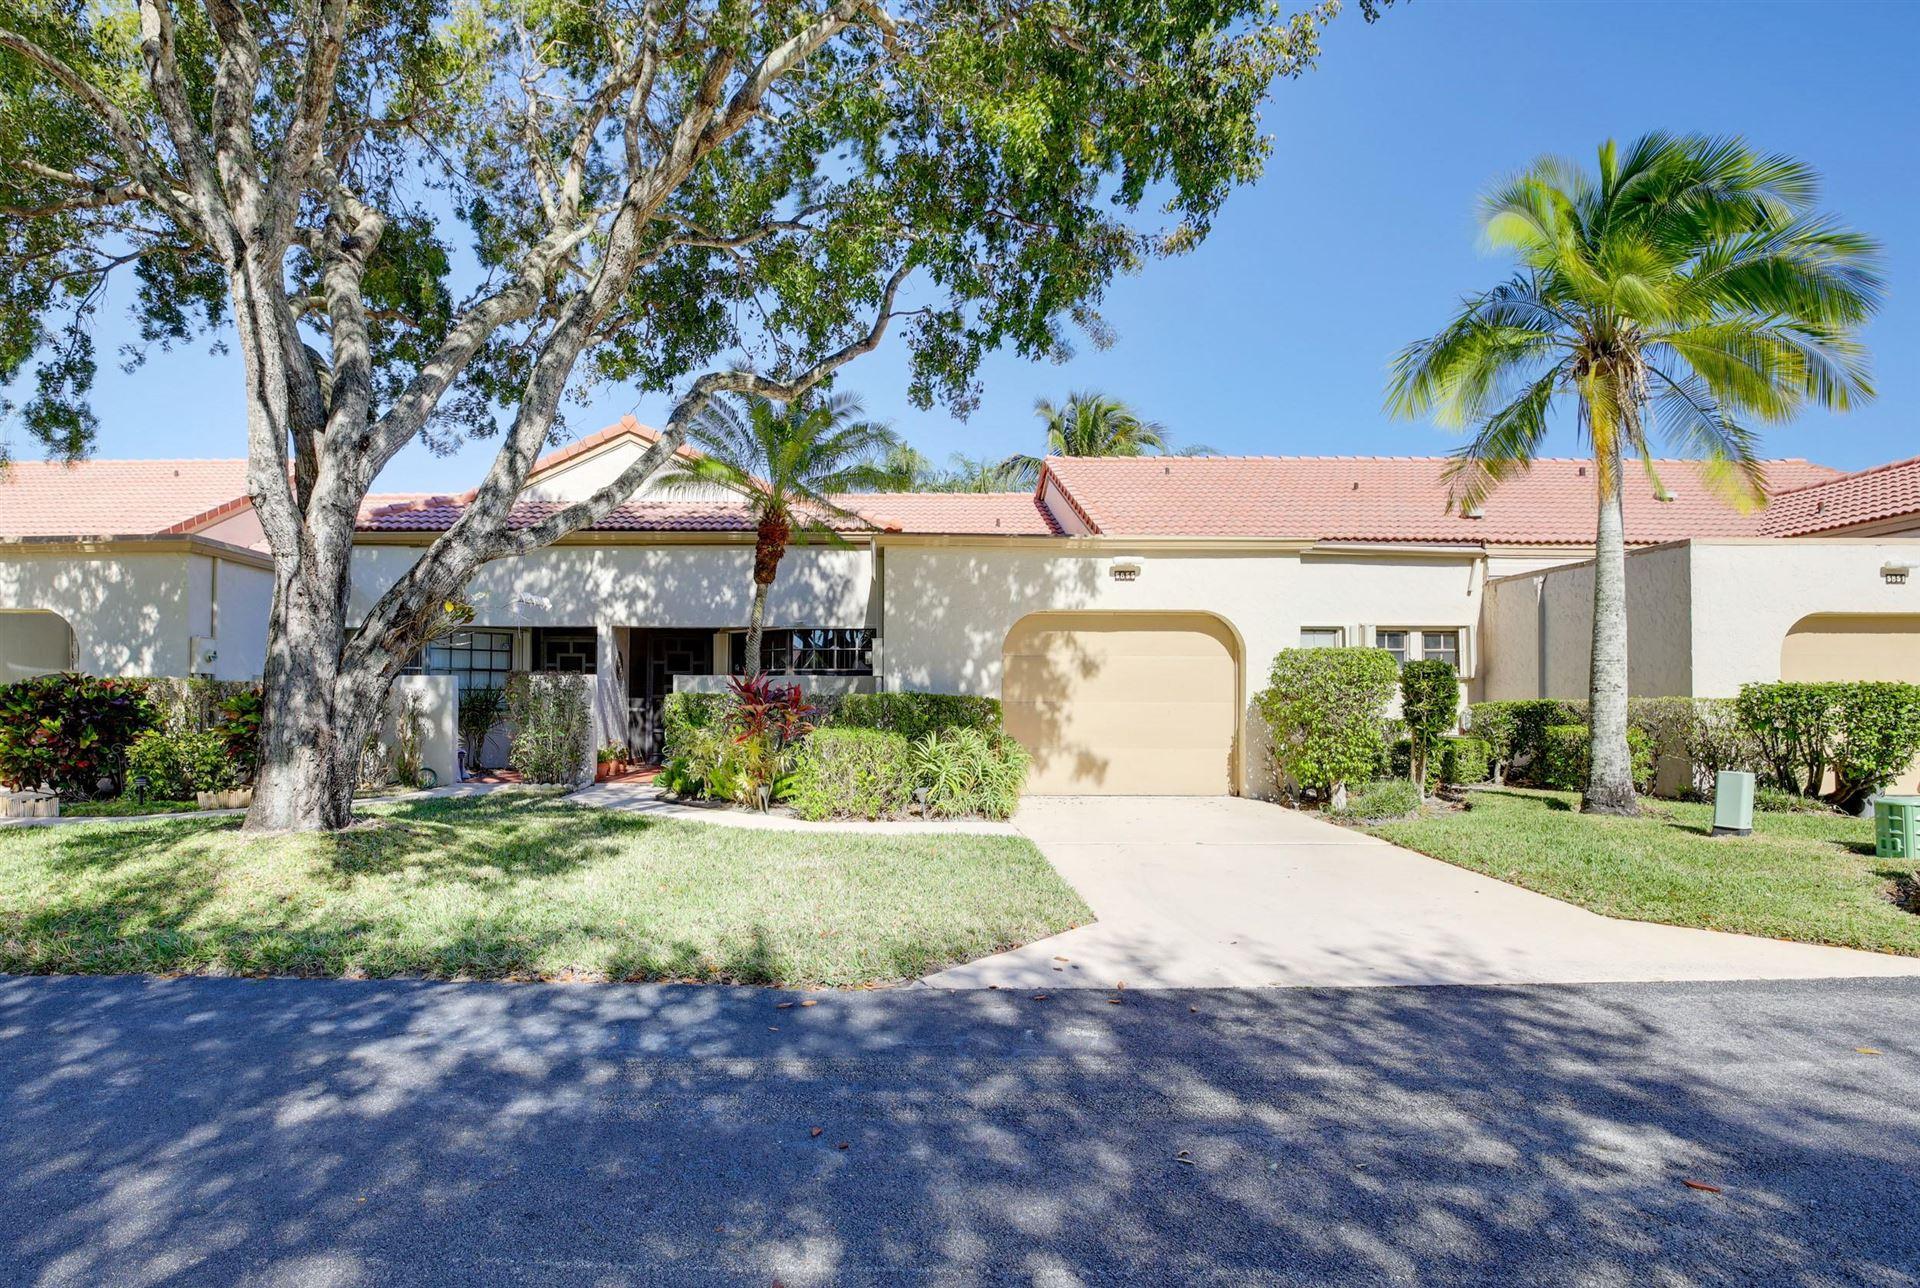 5855 Parkwalk Circle W, Boynton Beach, FL 33472 - #: RX-10688510